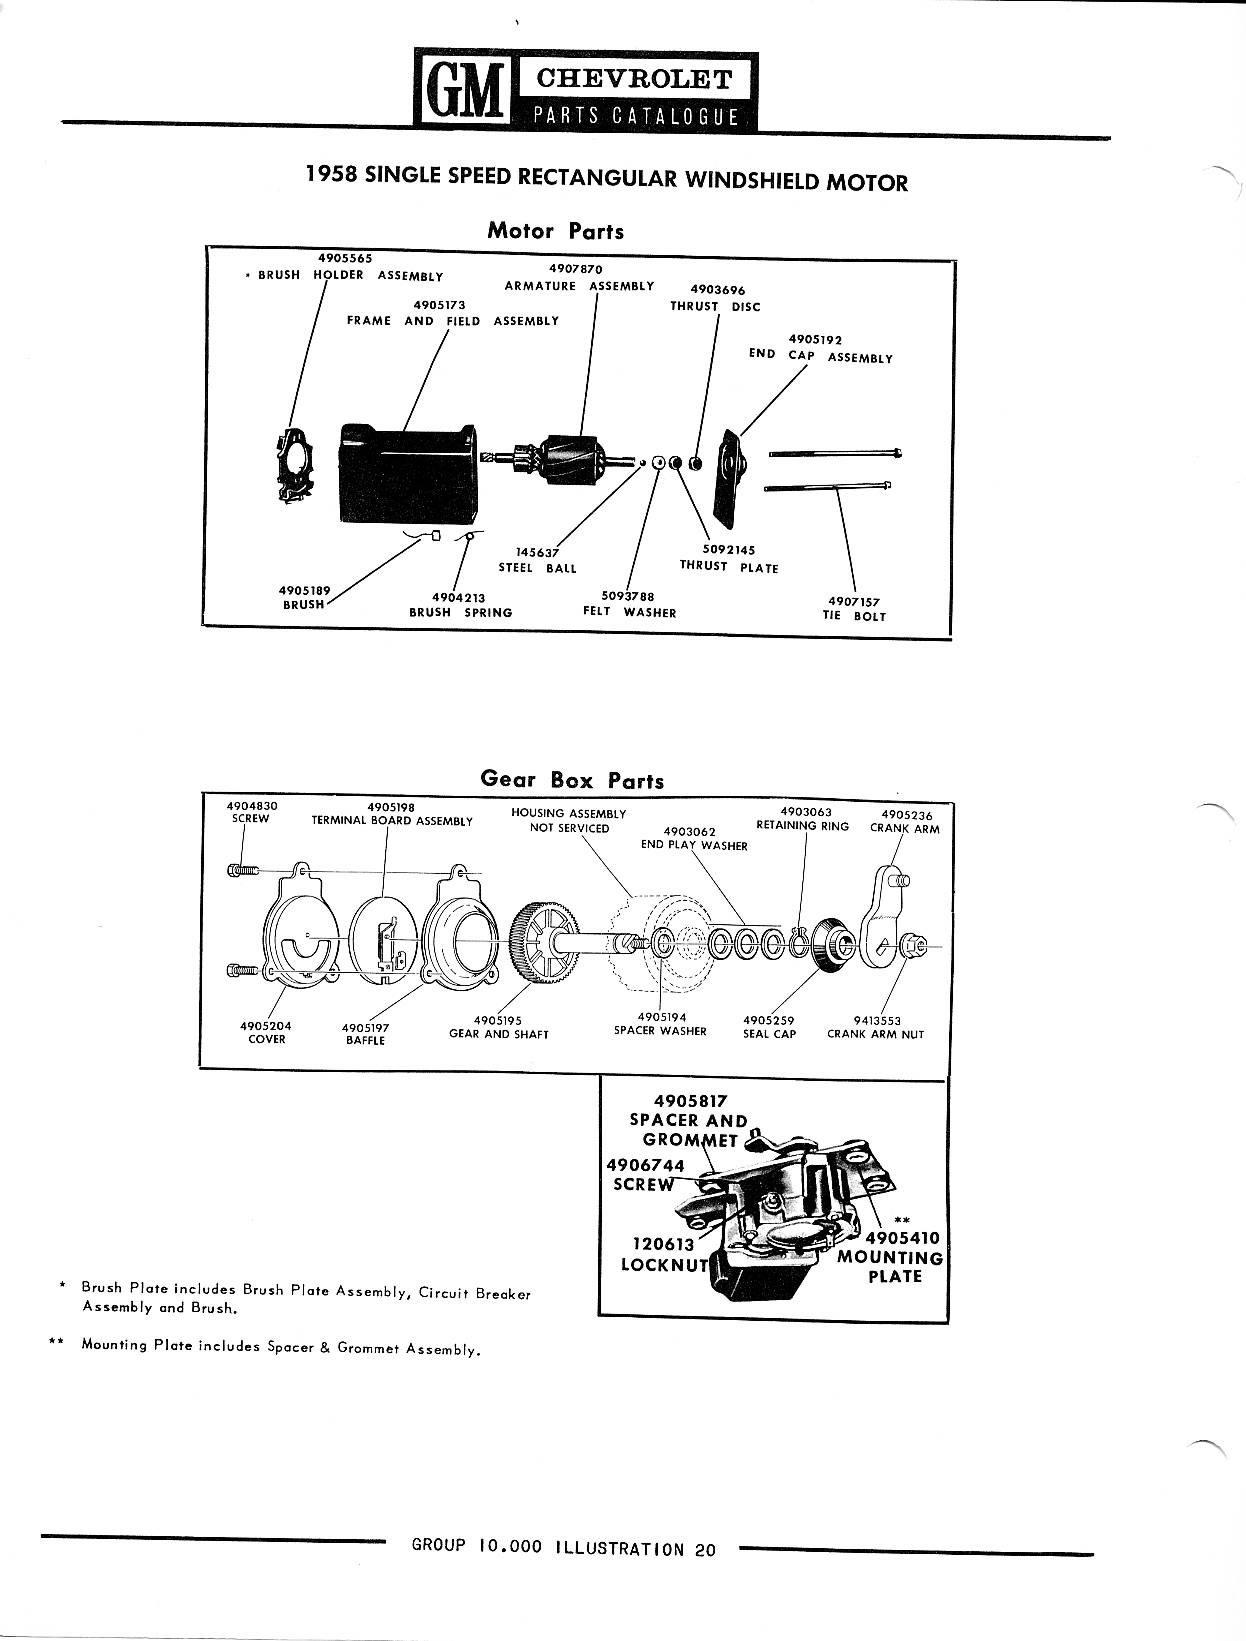 1958-1968 Chevrolet Parts Catalog / Image130.jpg